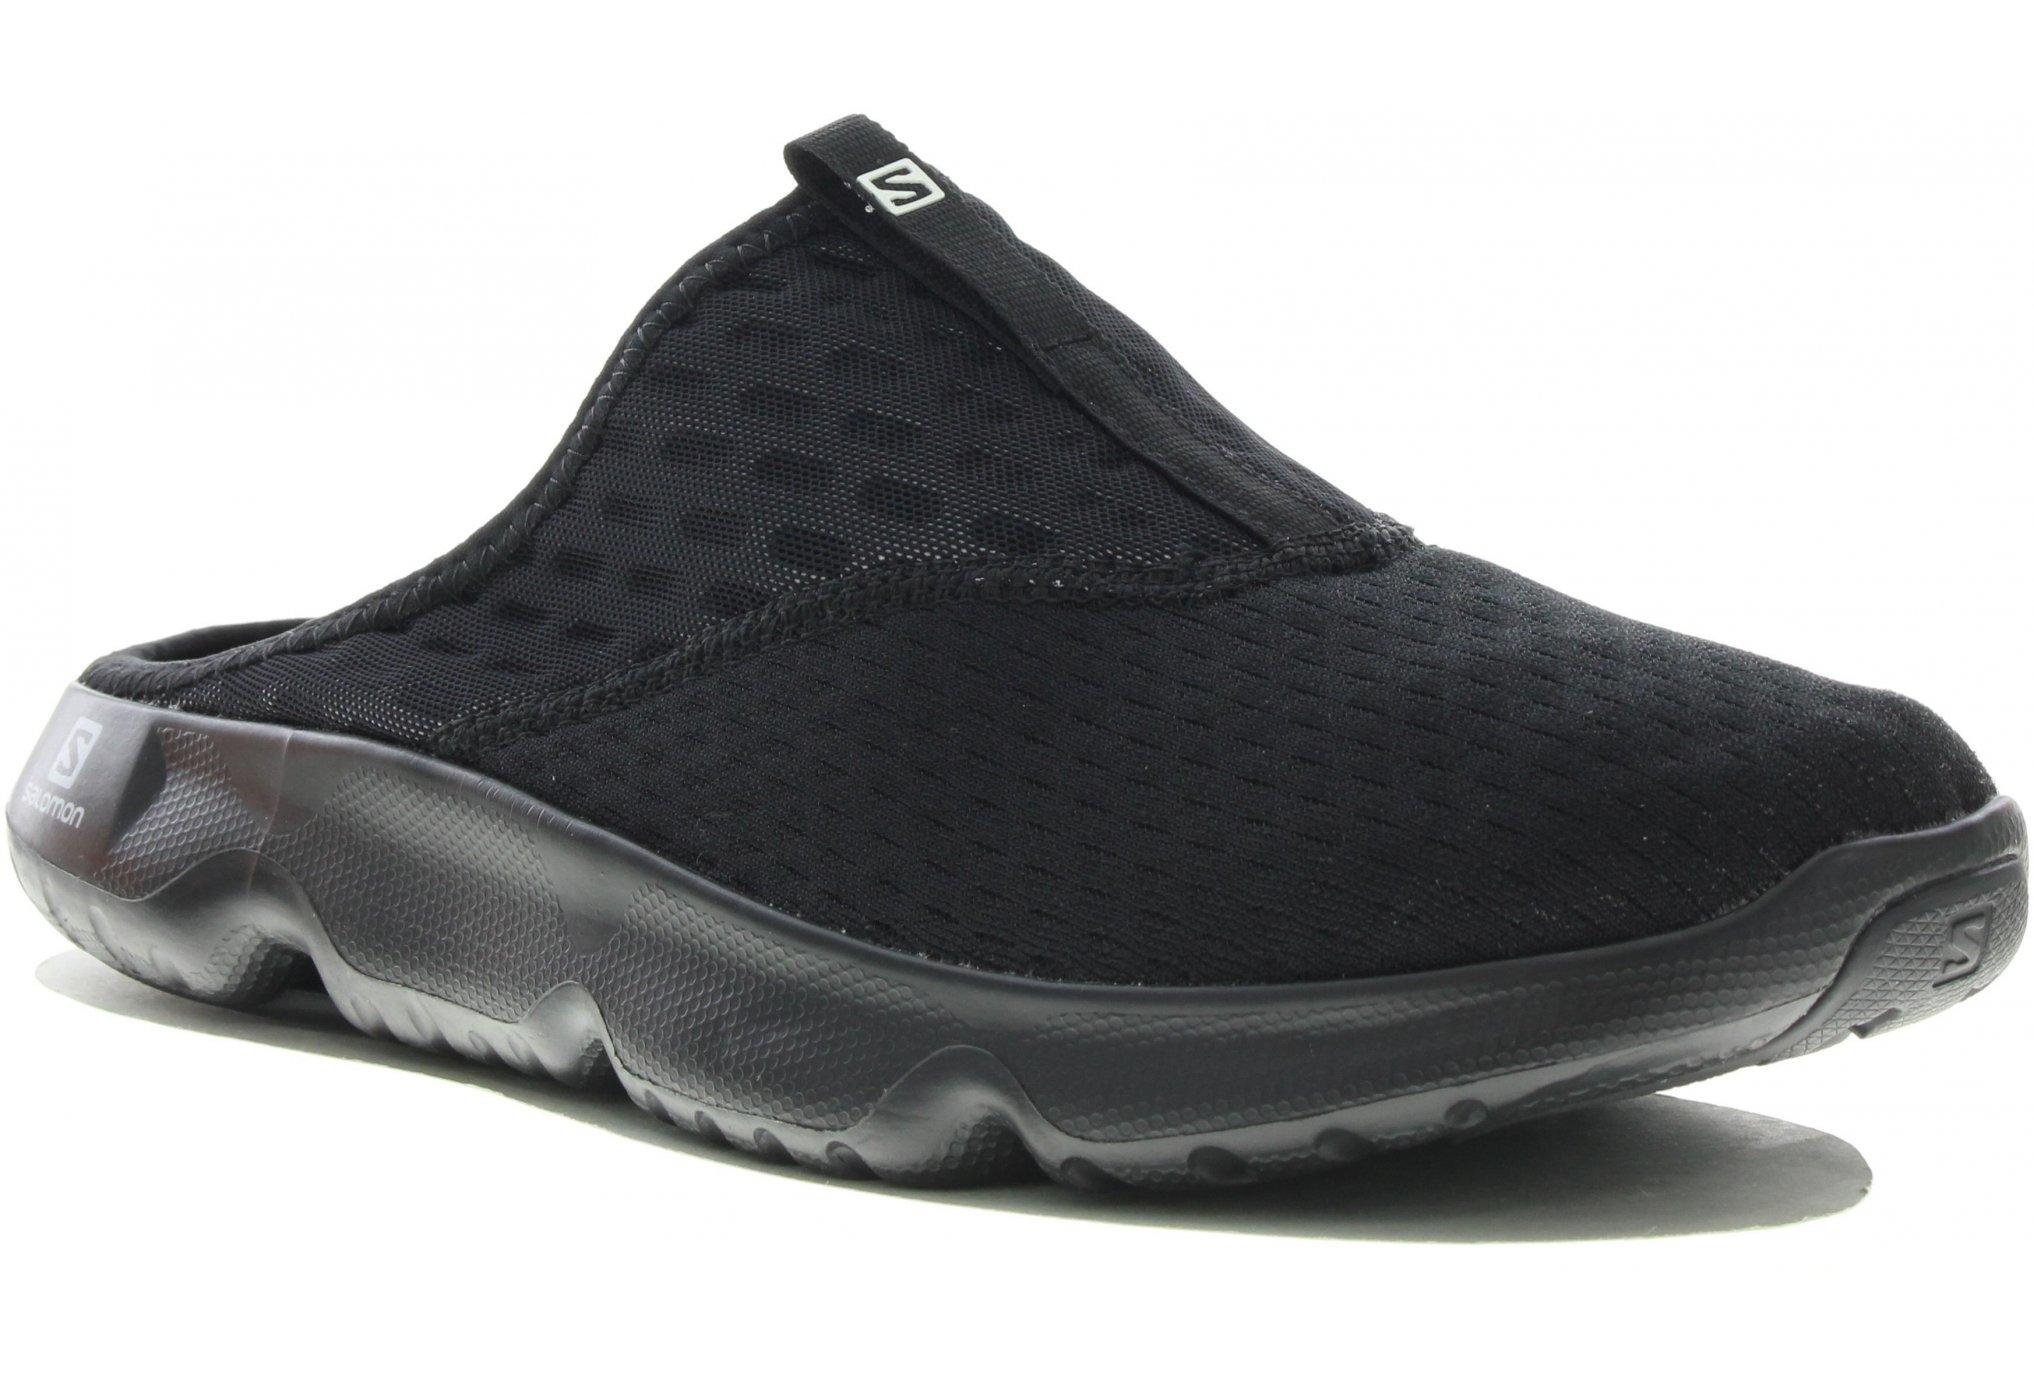 Salomon Reelax Slide 5.0 M Chaussures homme